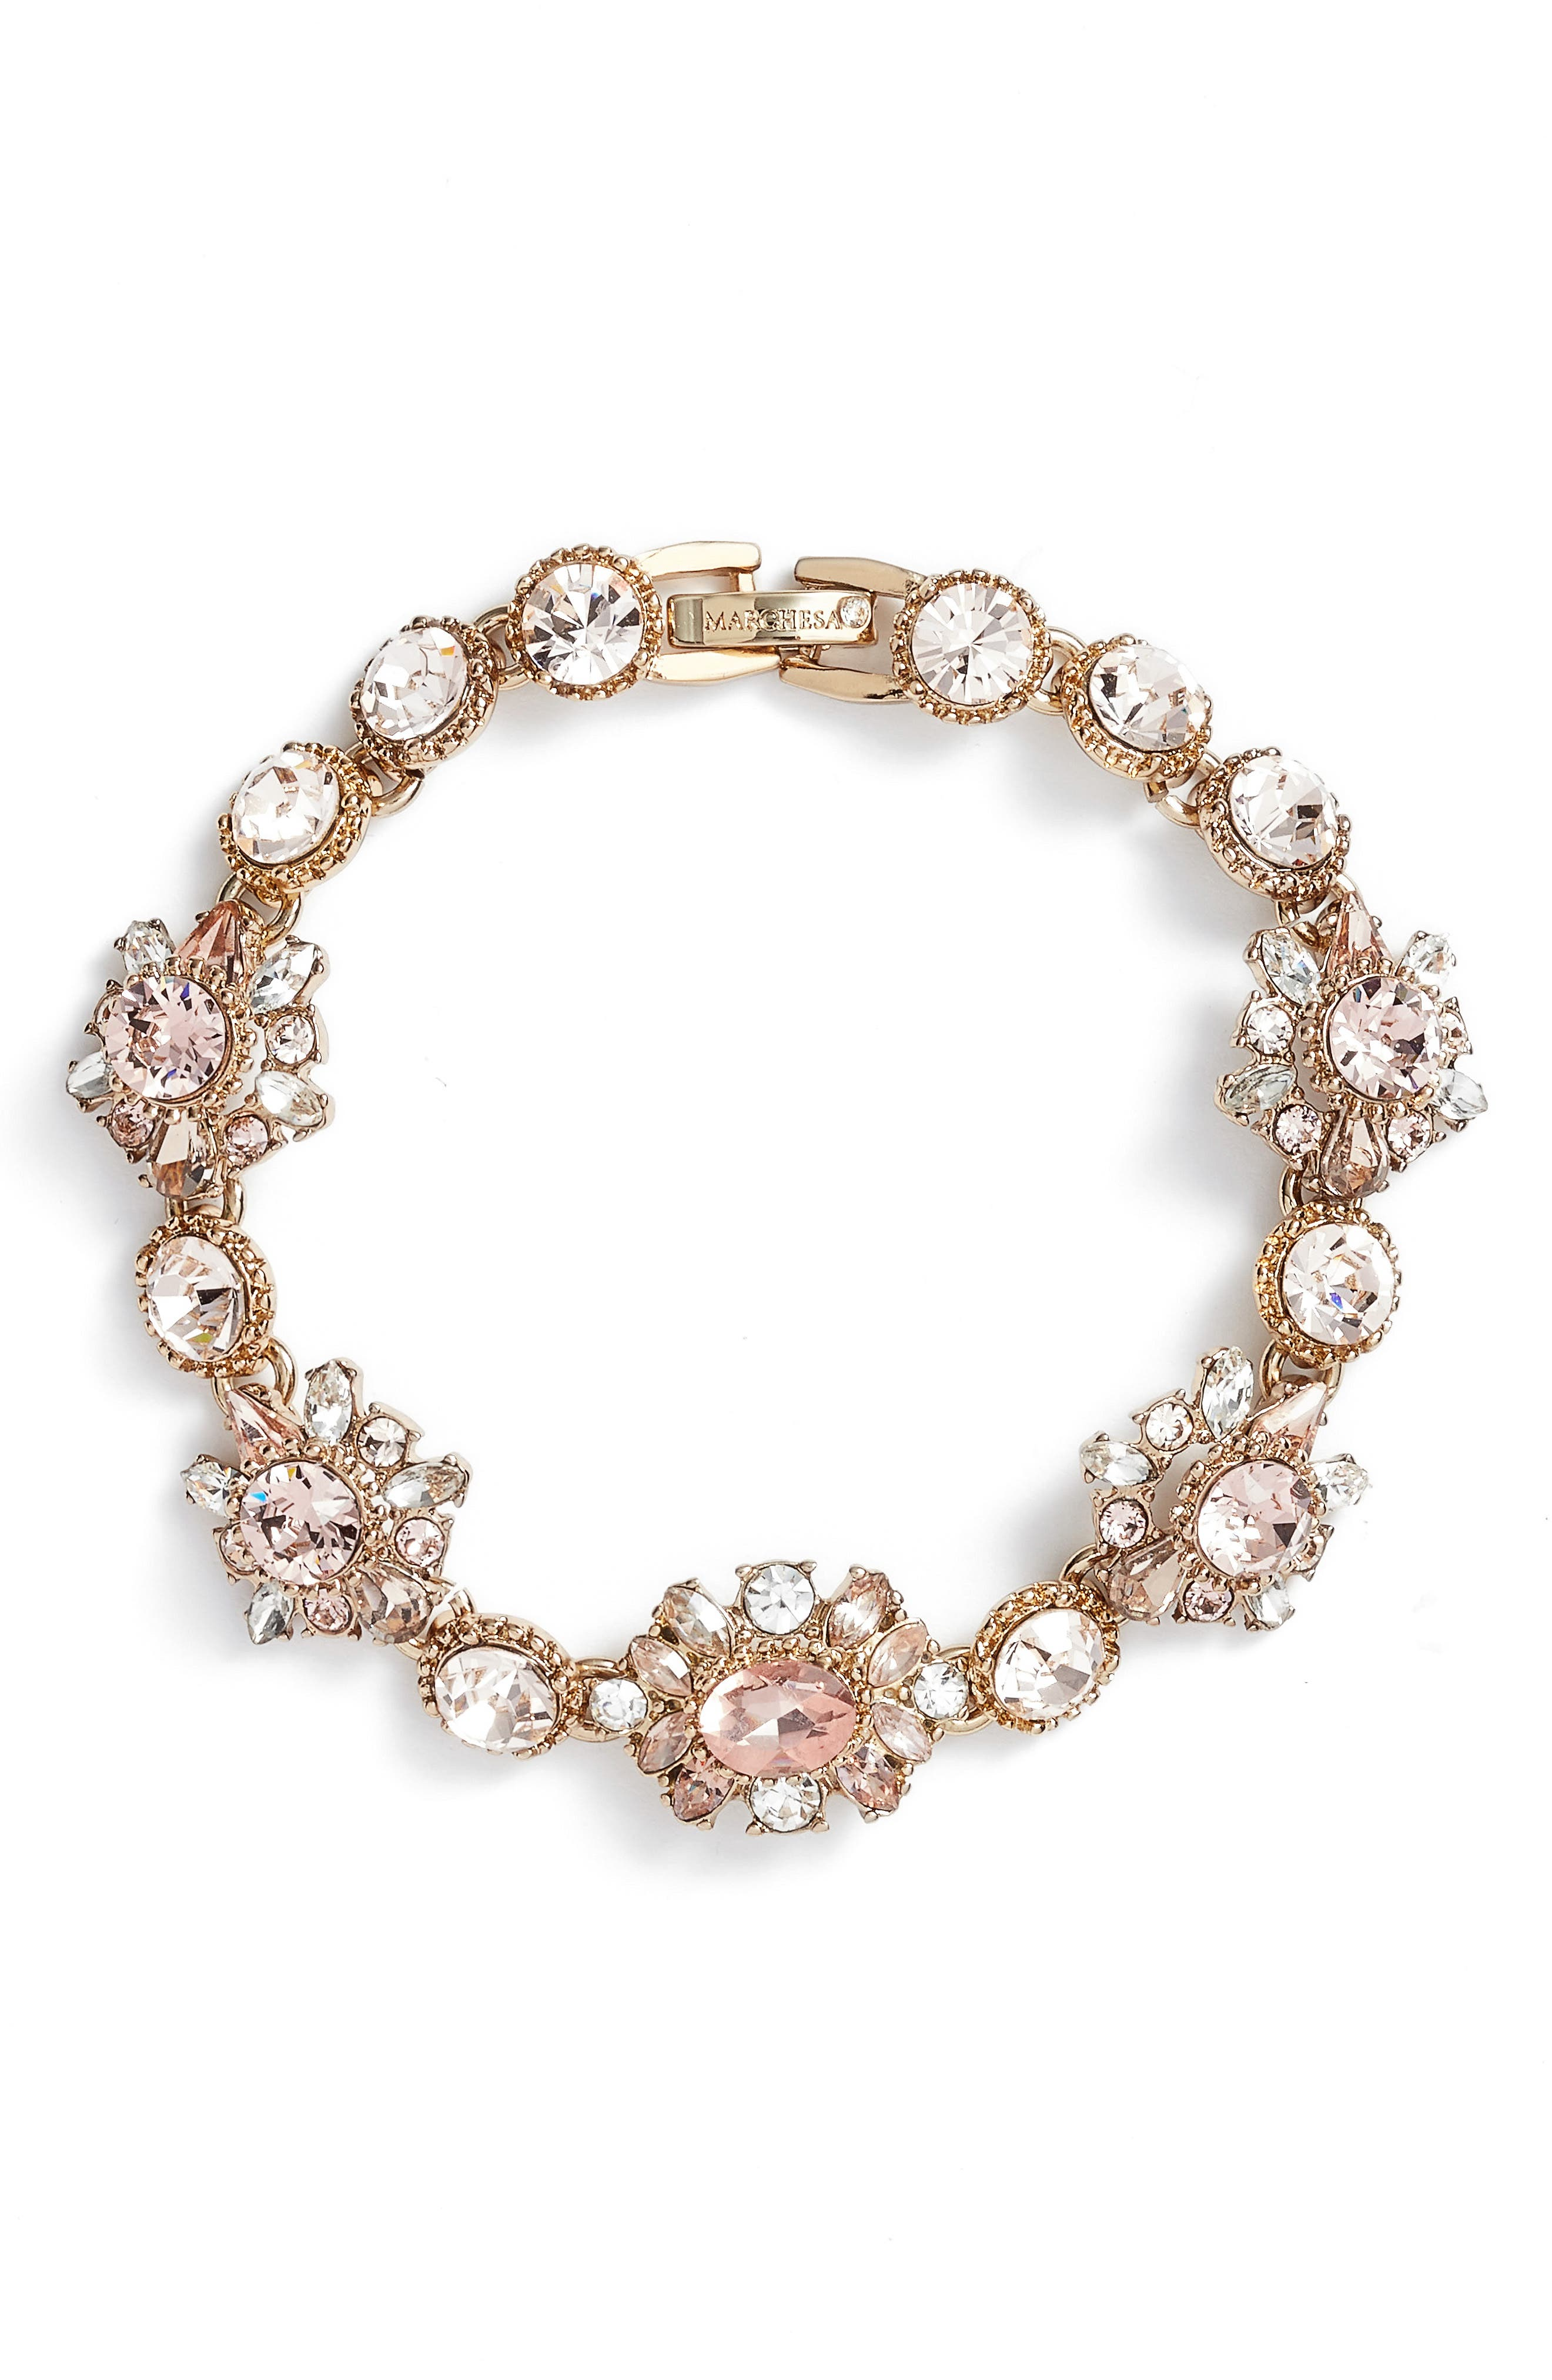 Line Bracelet,                             Main thumbnail 1, color,                             GOLD/ VINTAGE ROSE